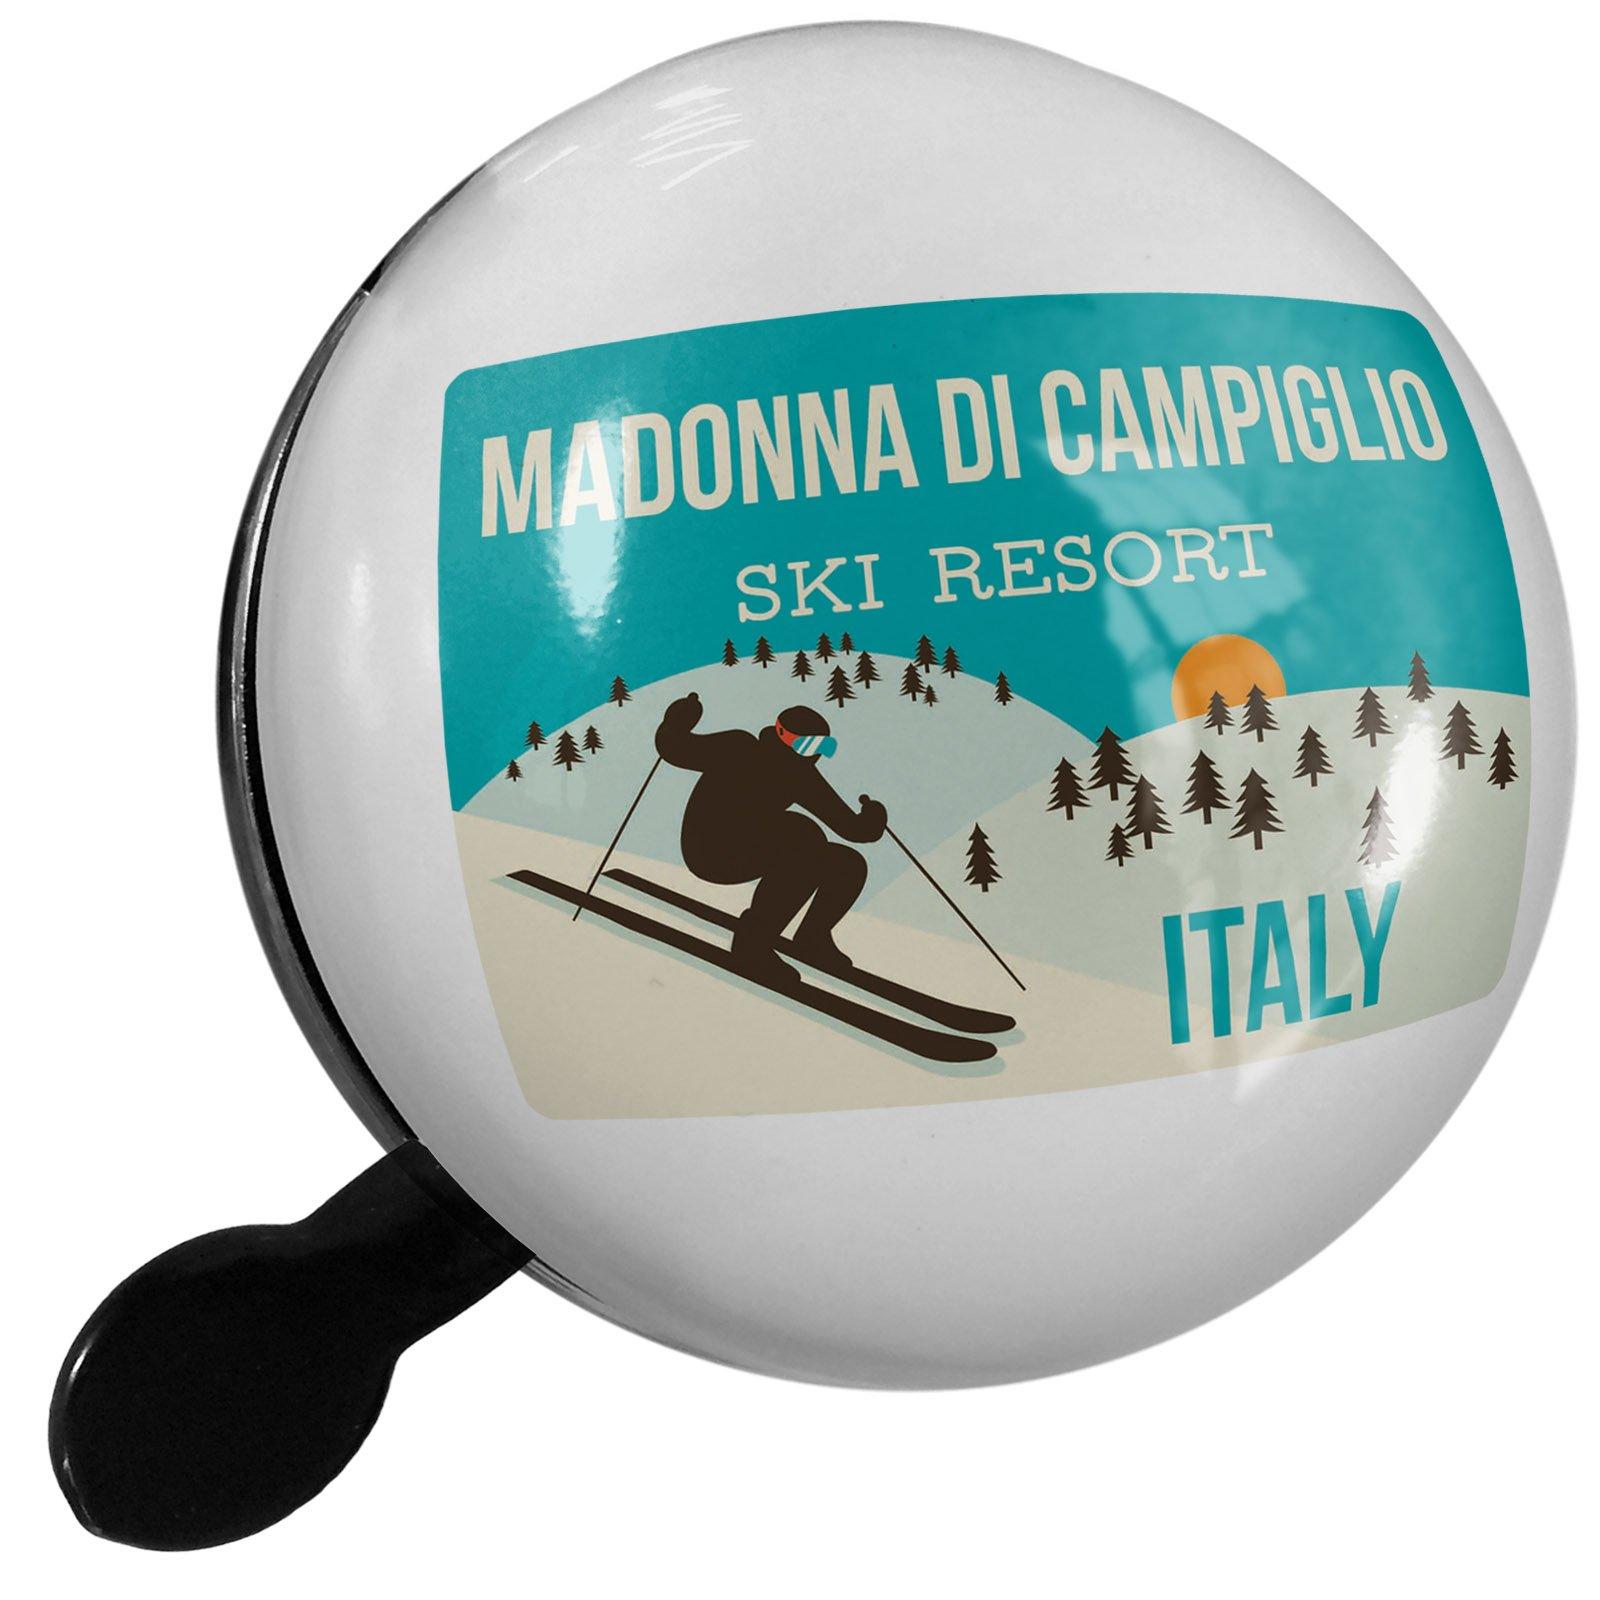 Small Bike Bell Madonna di Campiglio Ski Resort - Italy Ski Resort - NEONBLOND